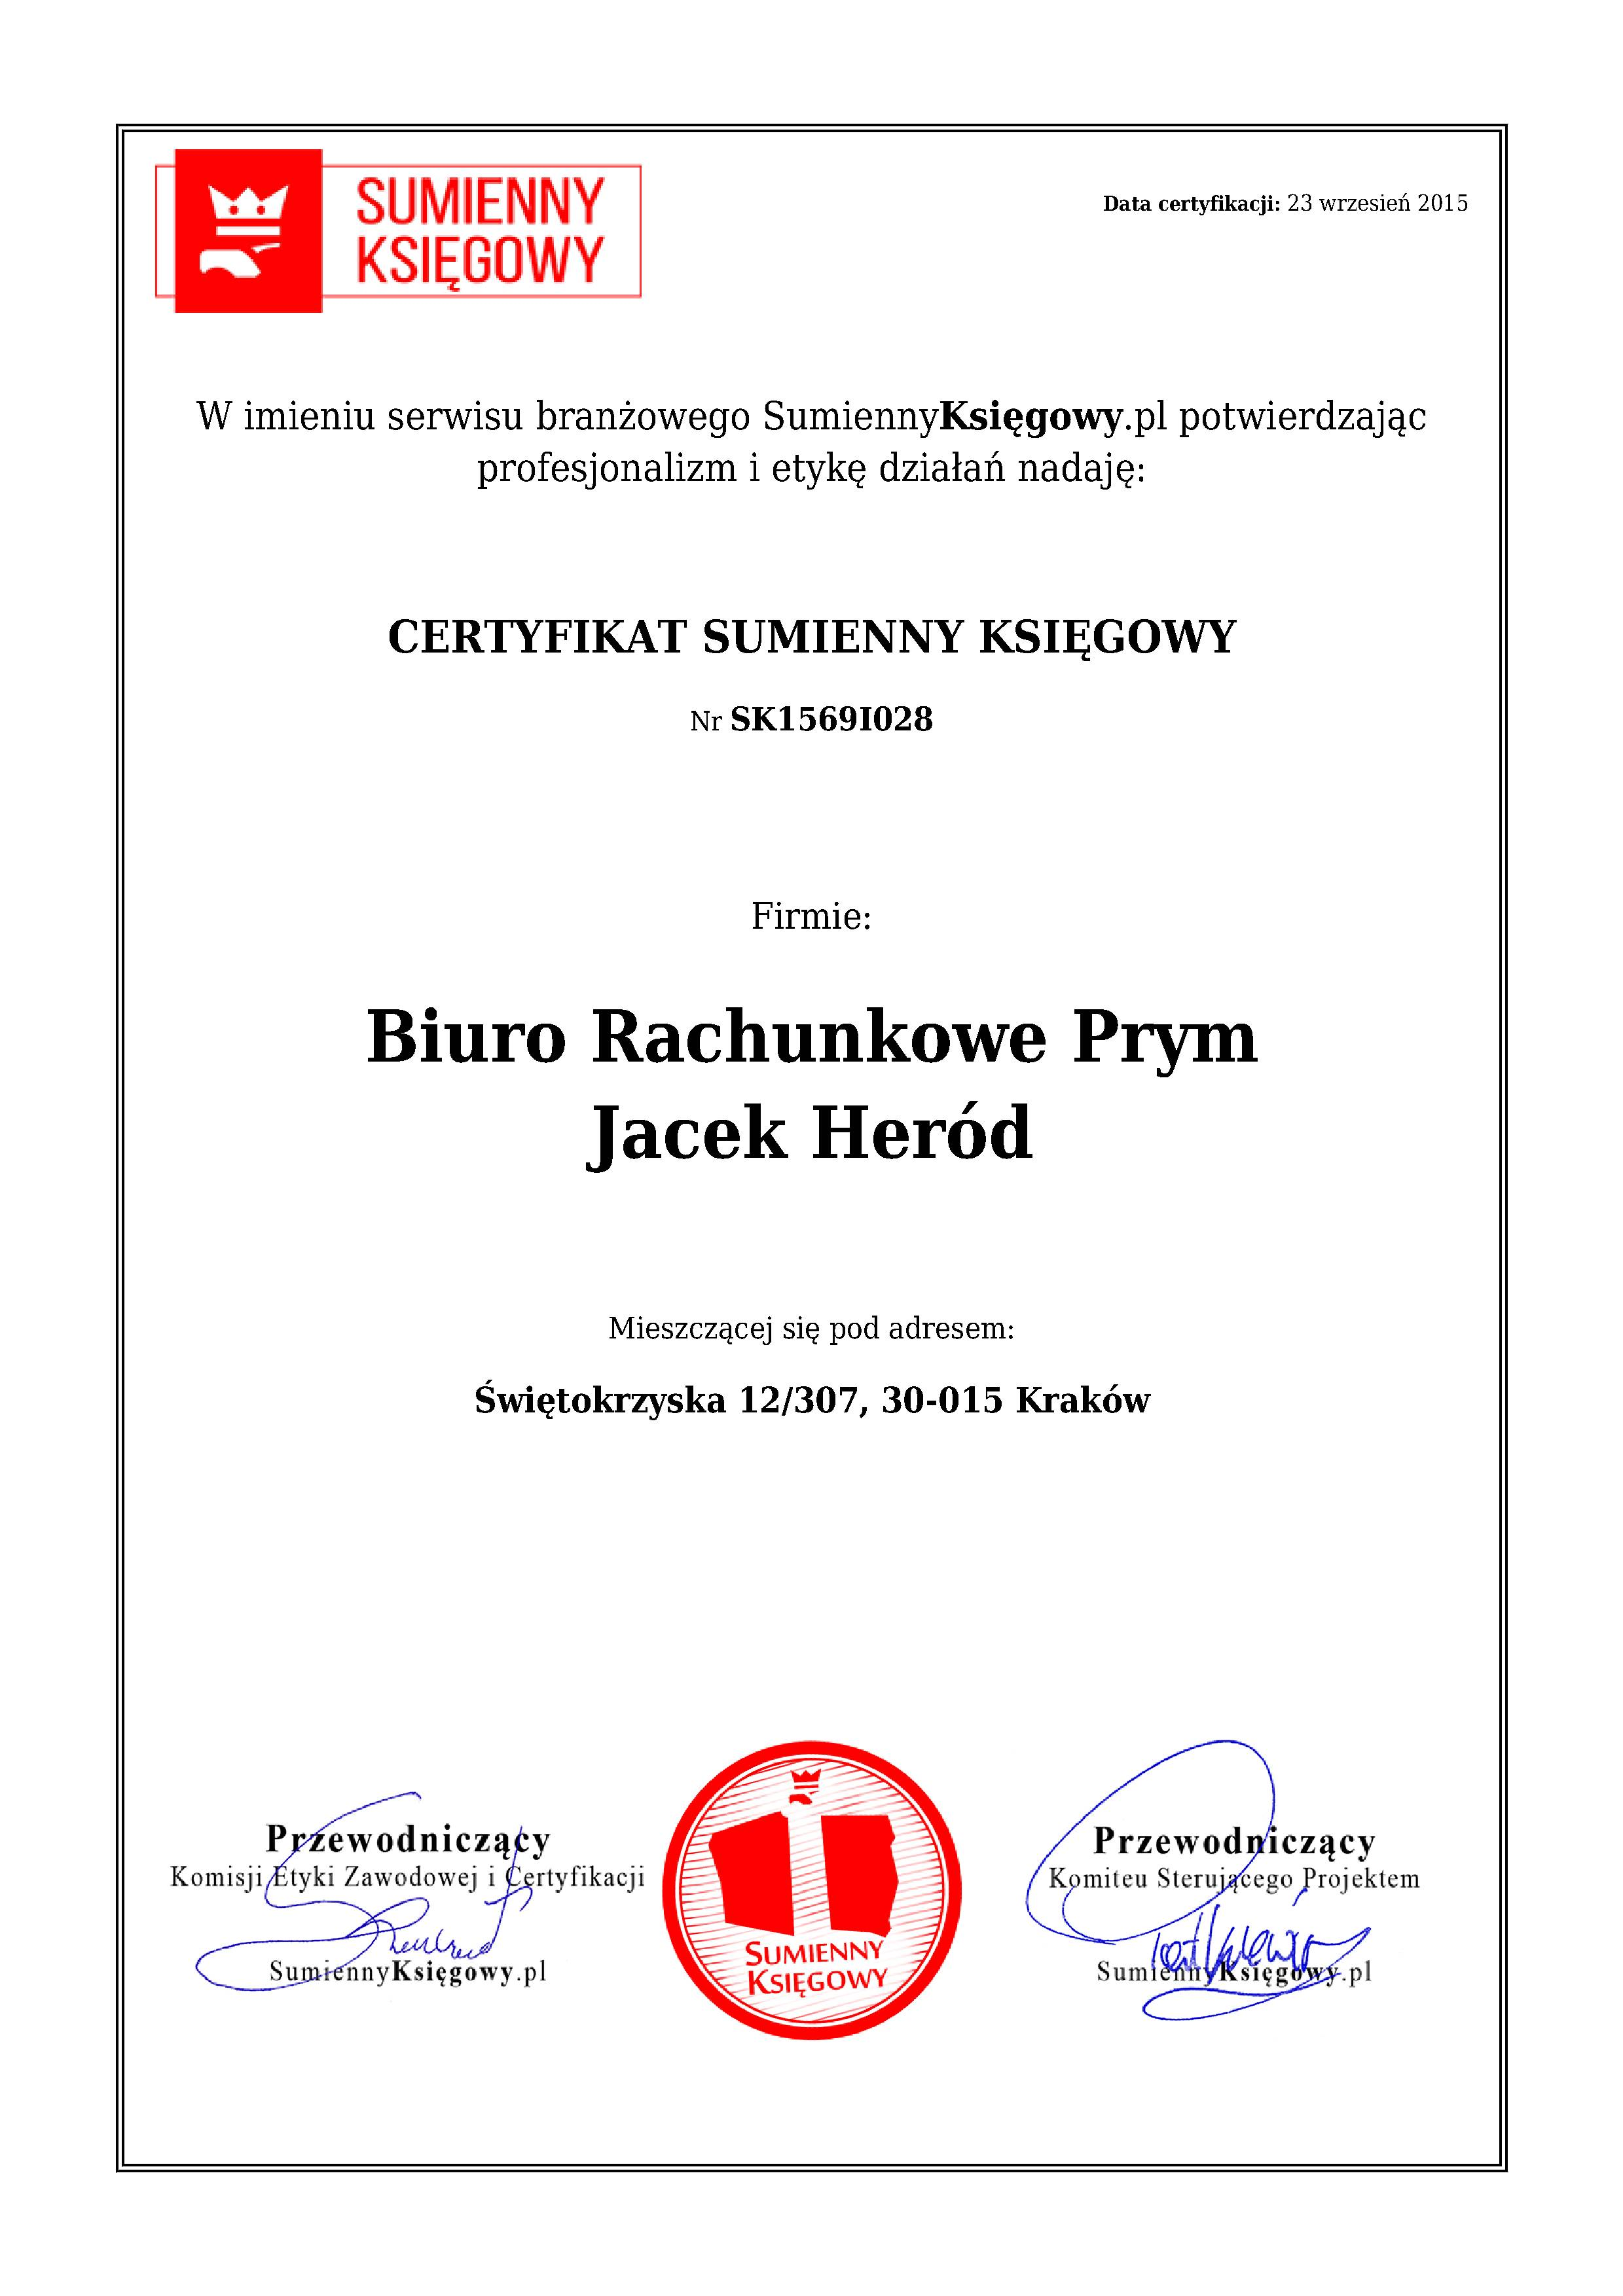 Certyfikat Biuro Rachunkowe Prym Jacek Heród